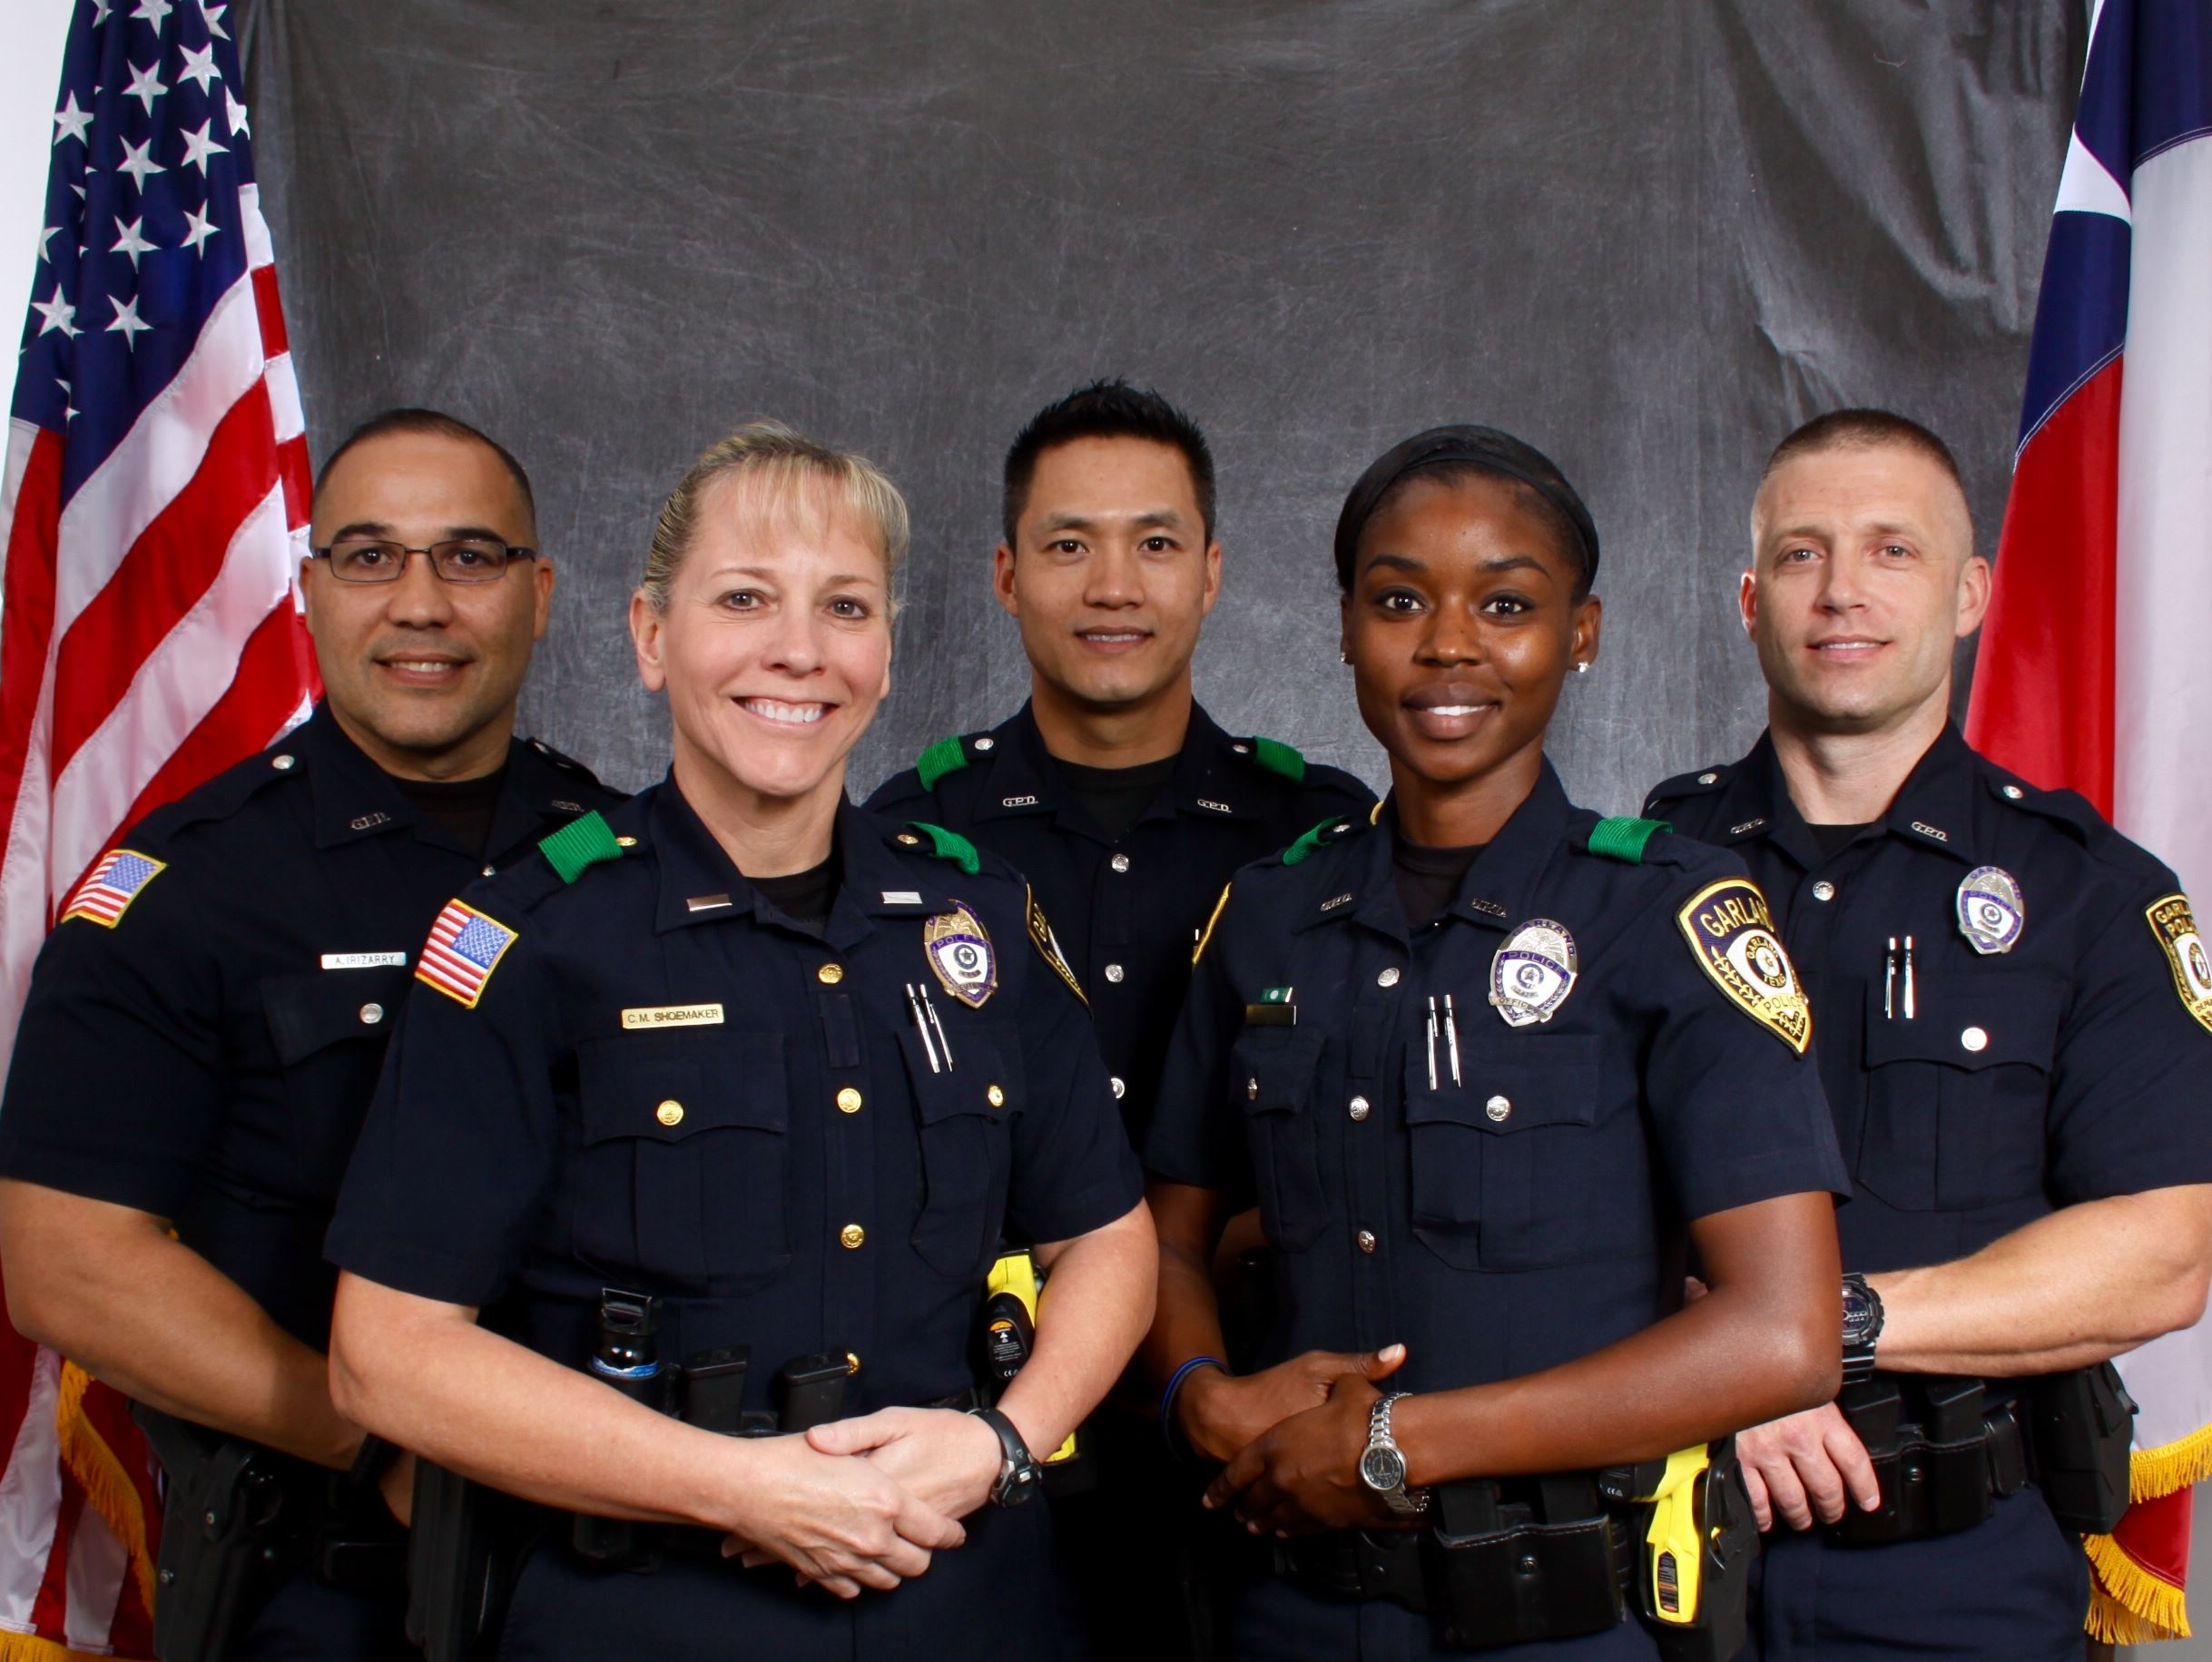 Police | Garland, TX